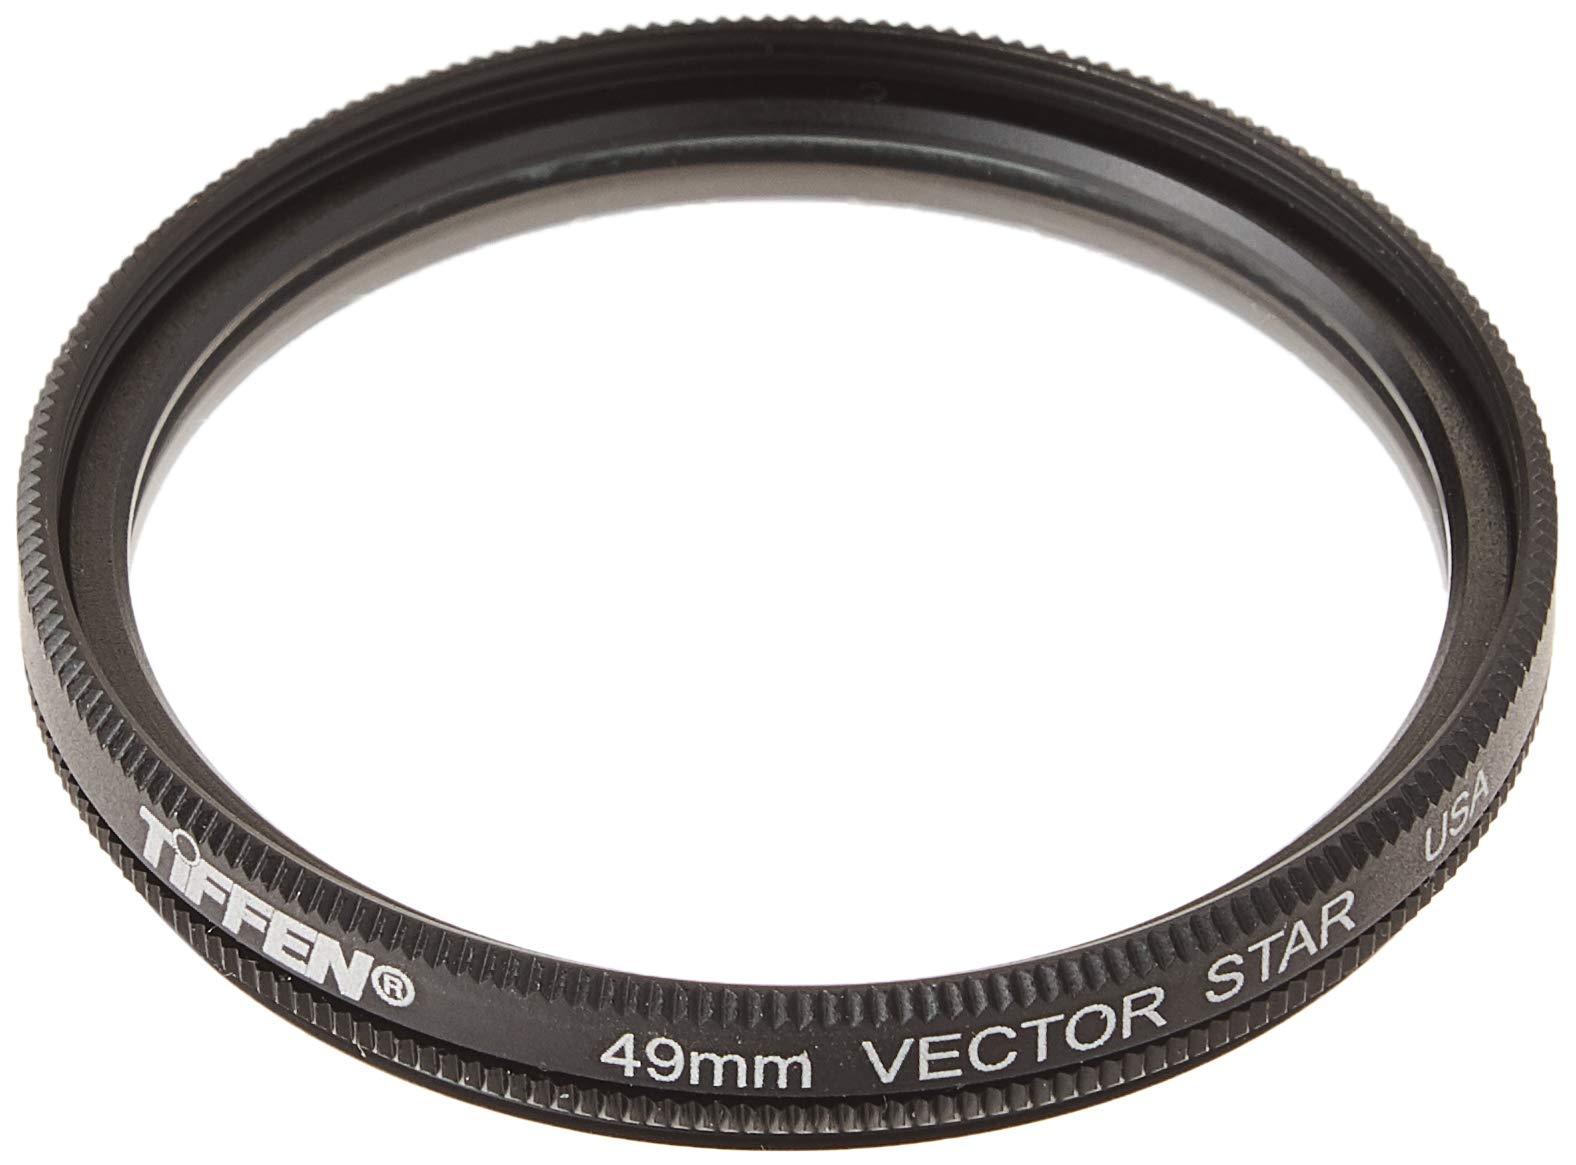 Tiffen 49VSTR 49mm Vector Star Filter by Tiffen